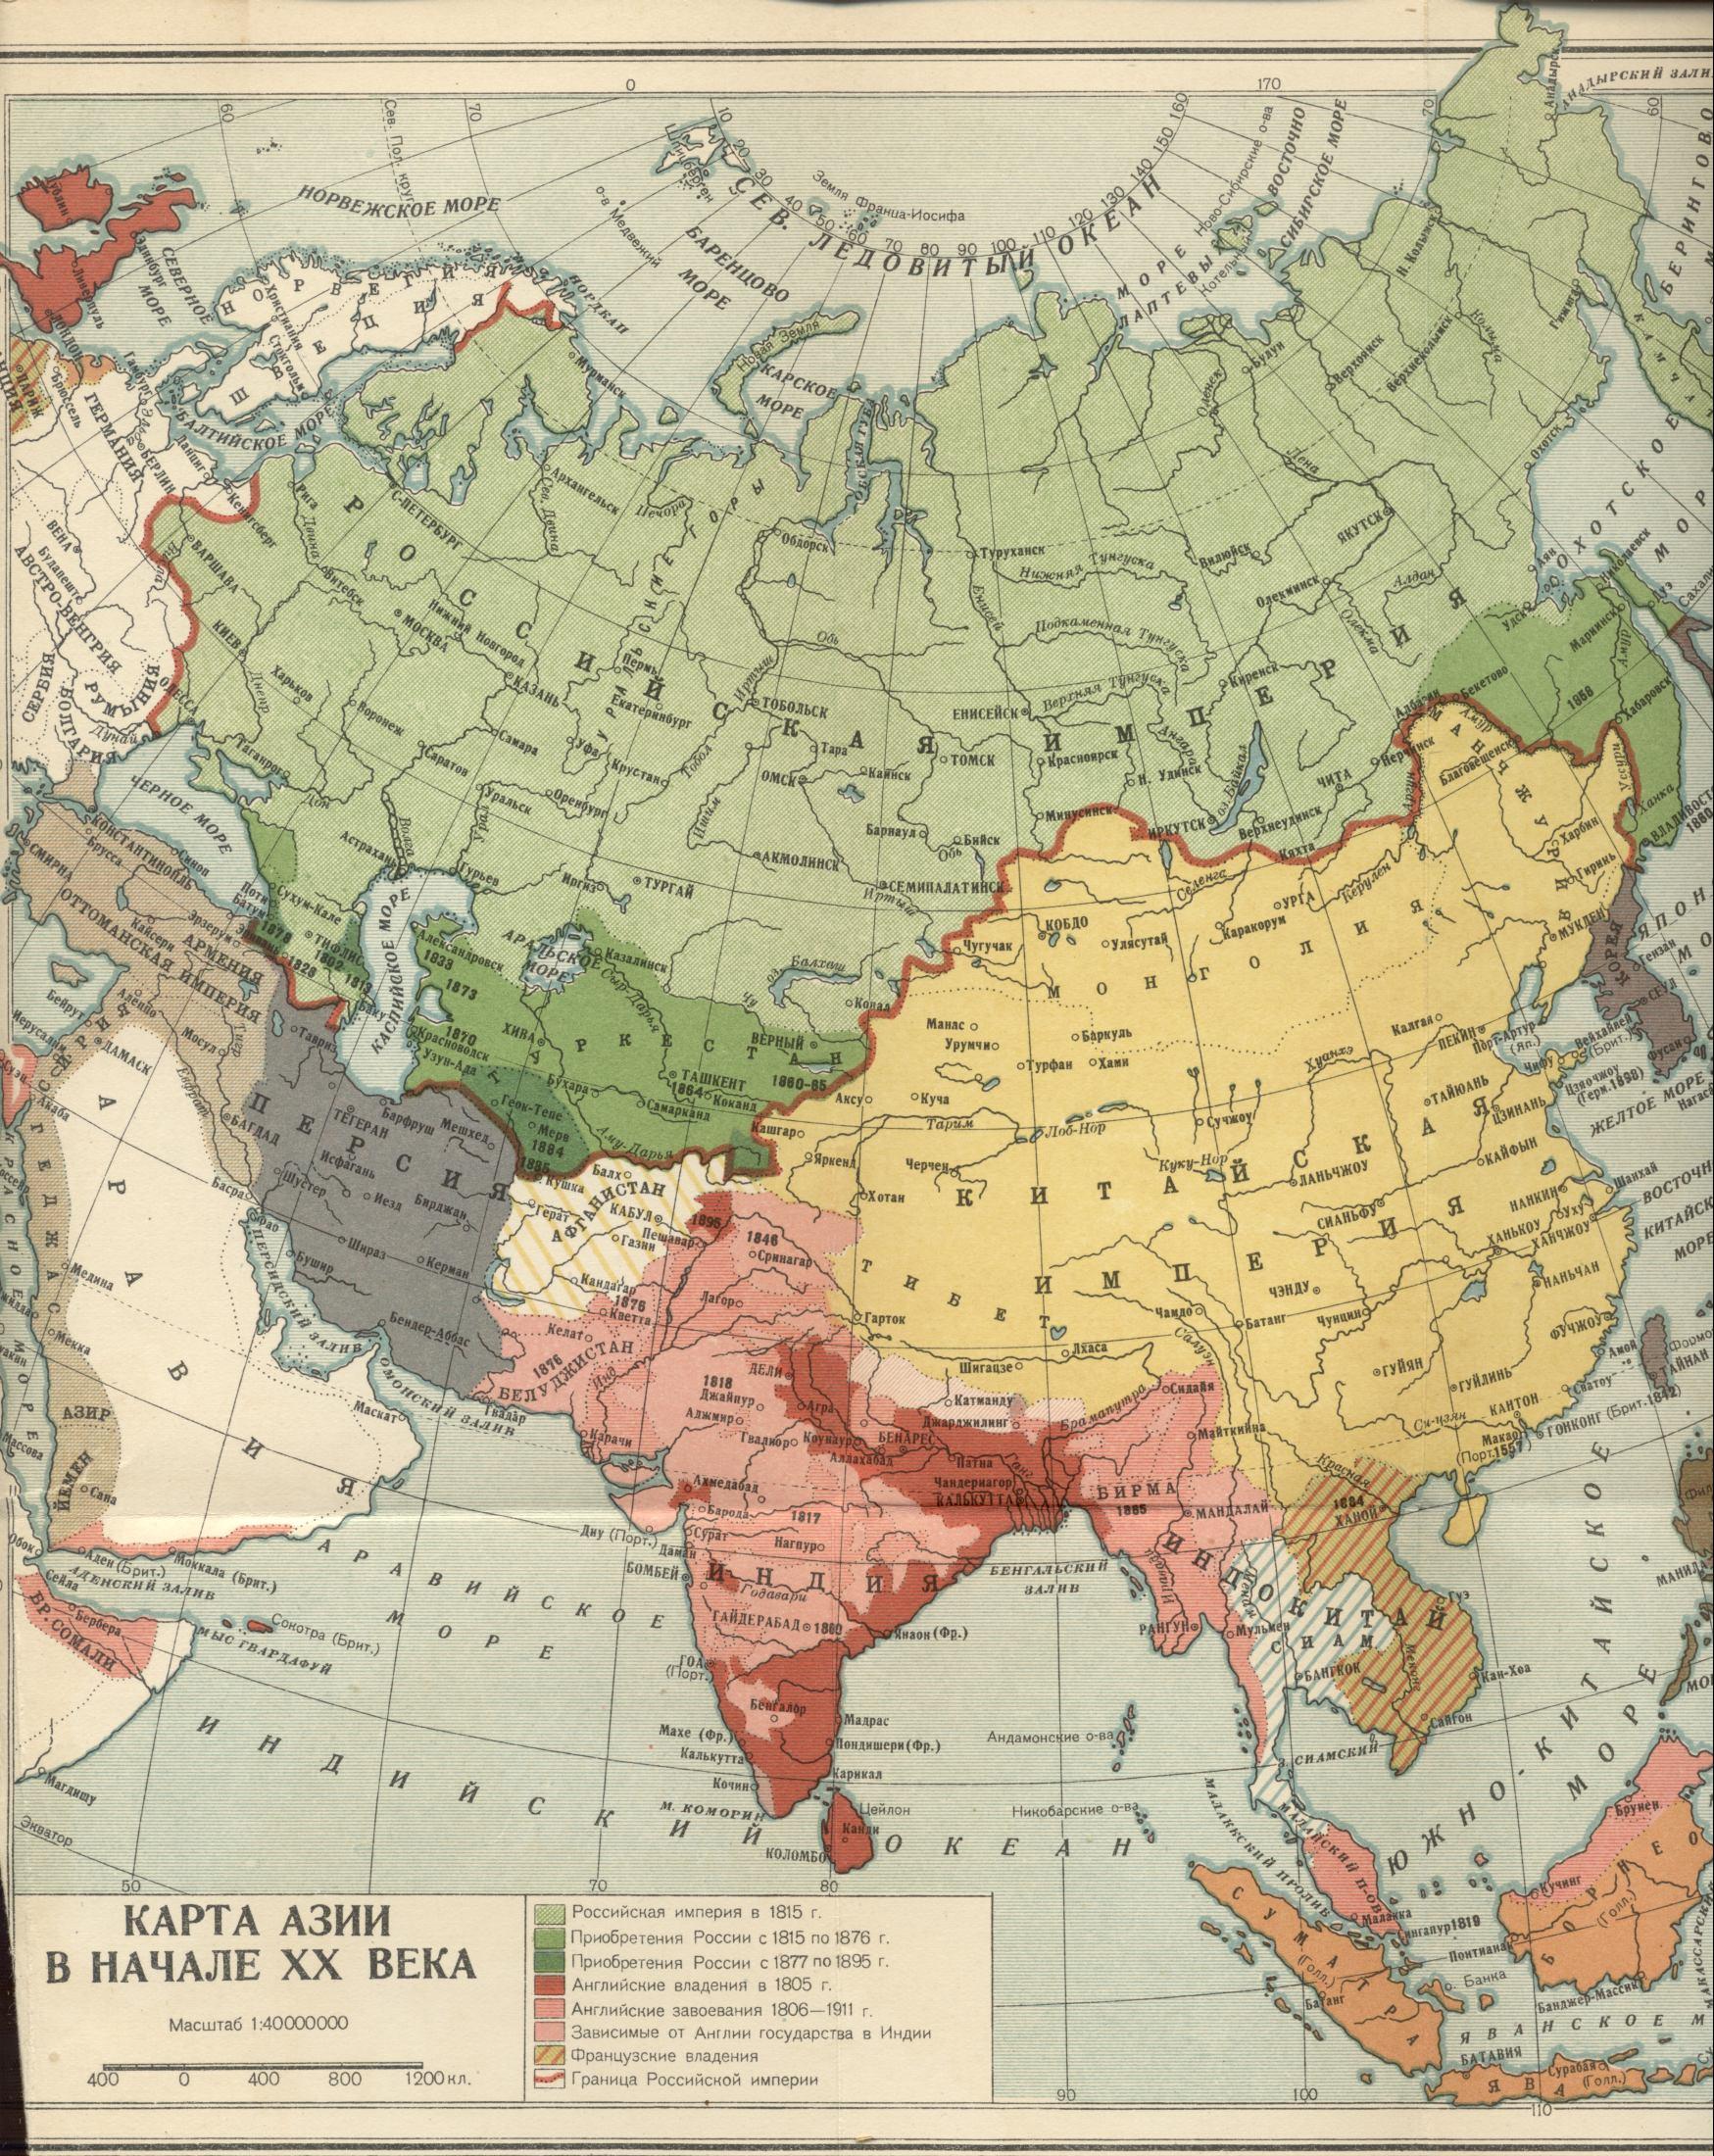 Карта мира карта азии в начале 20 века